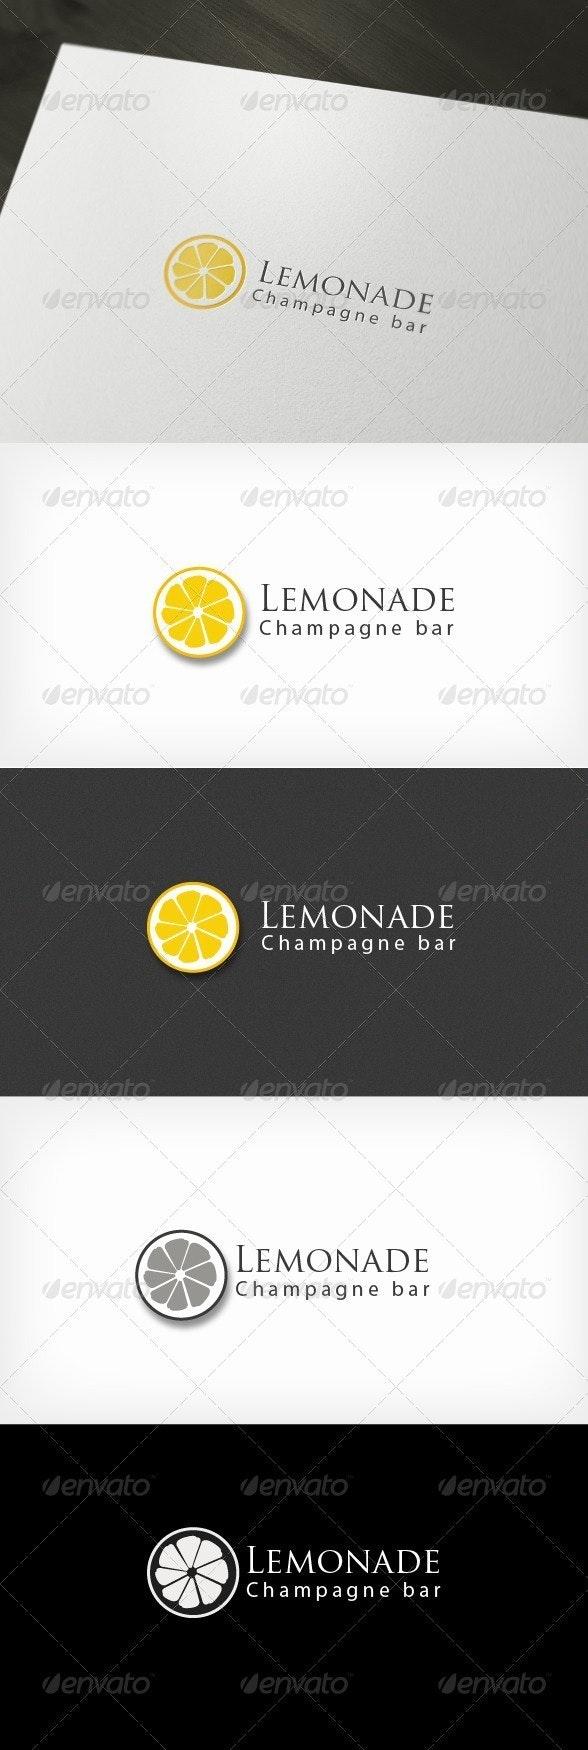 Lemonade Bar - Logo Templates